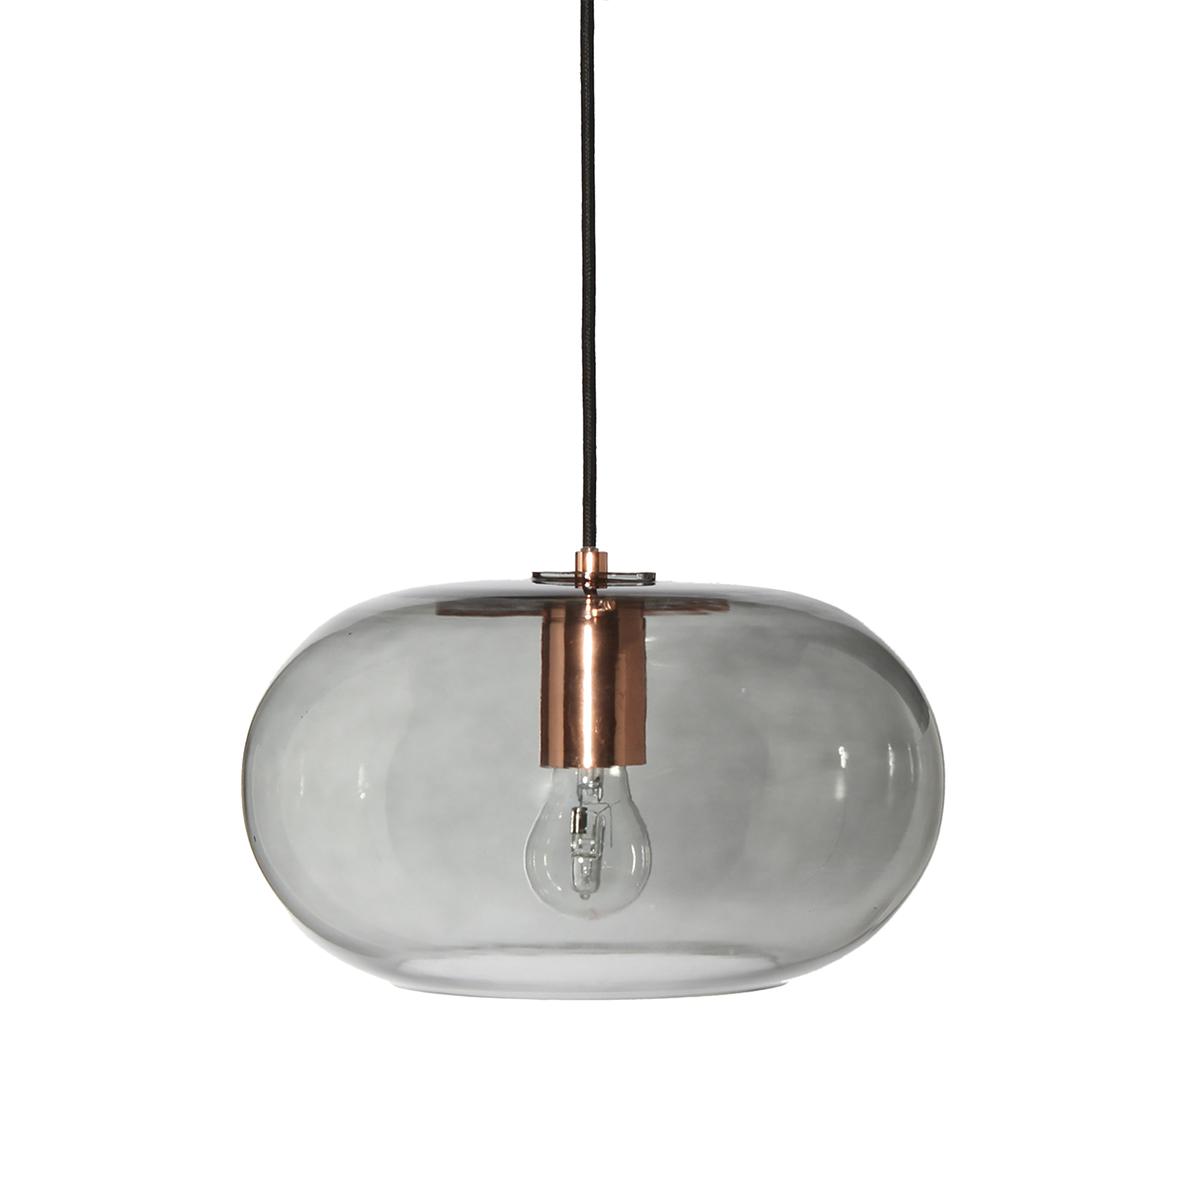 Lustra Kobe New Smoked / Copper